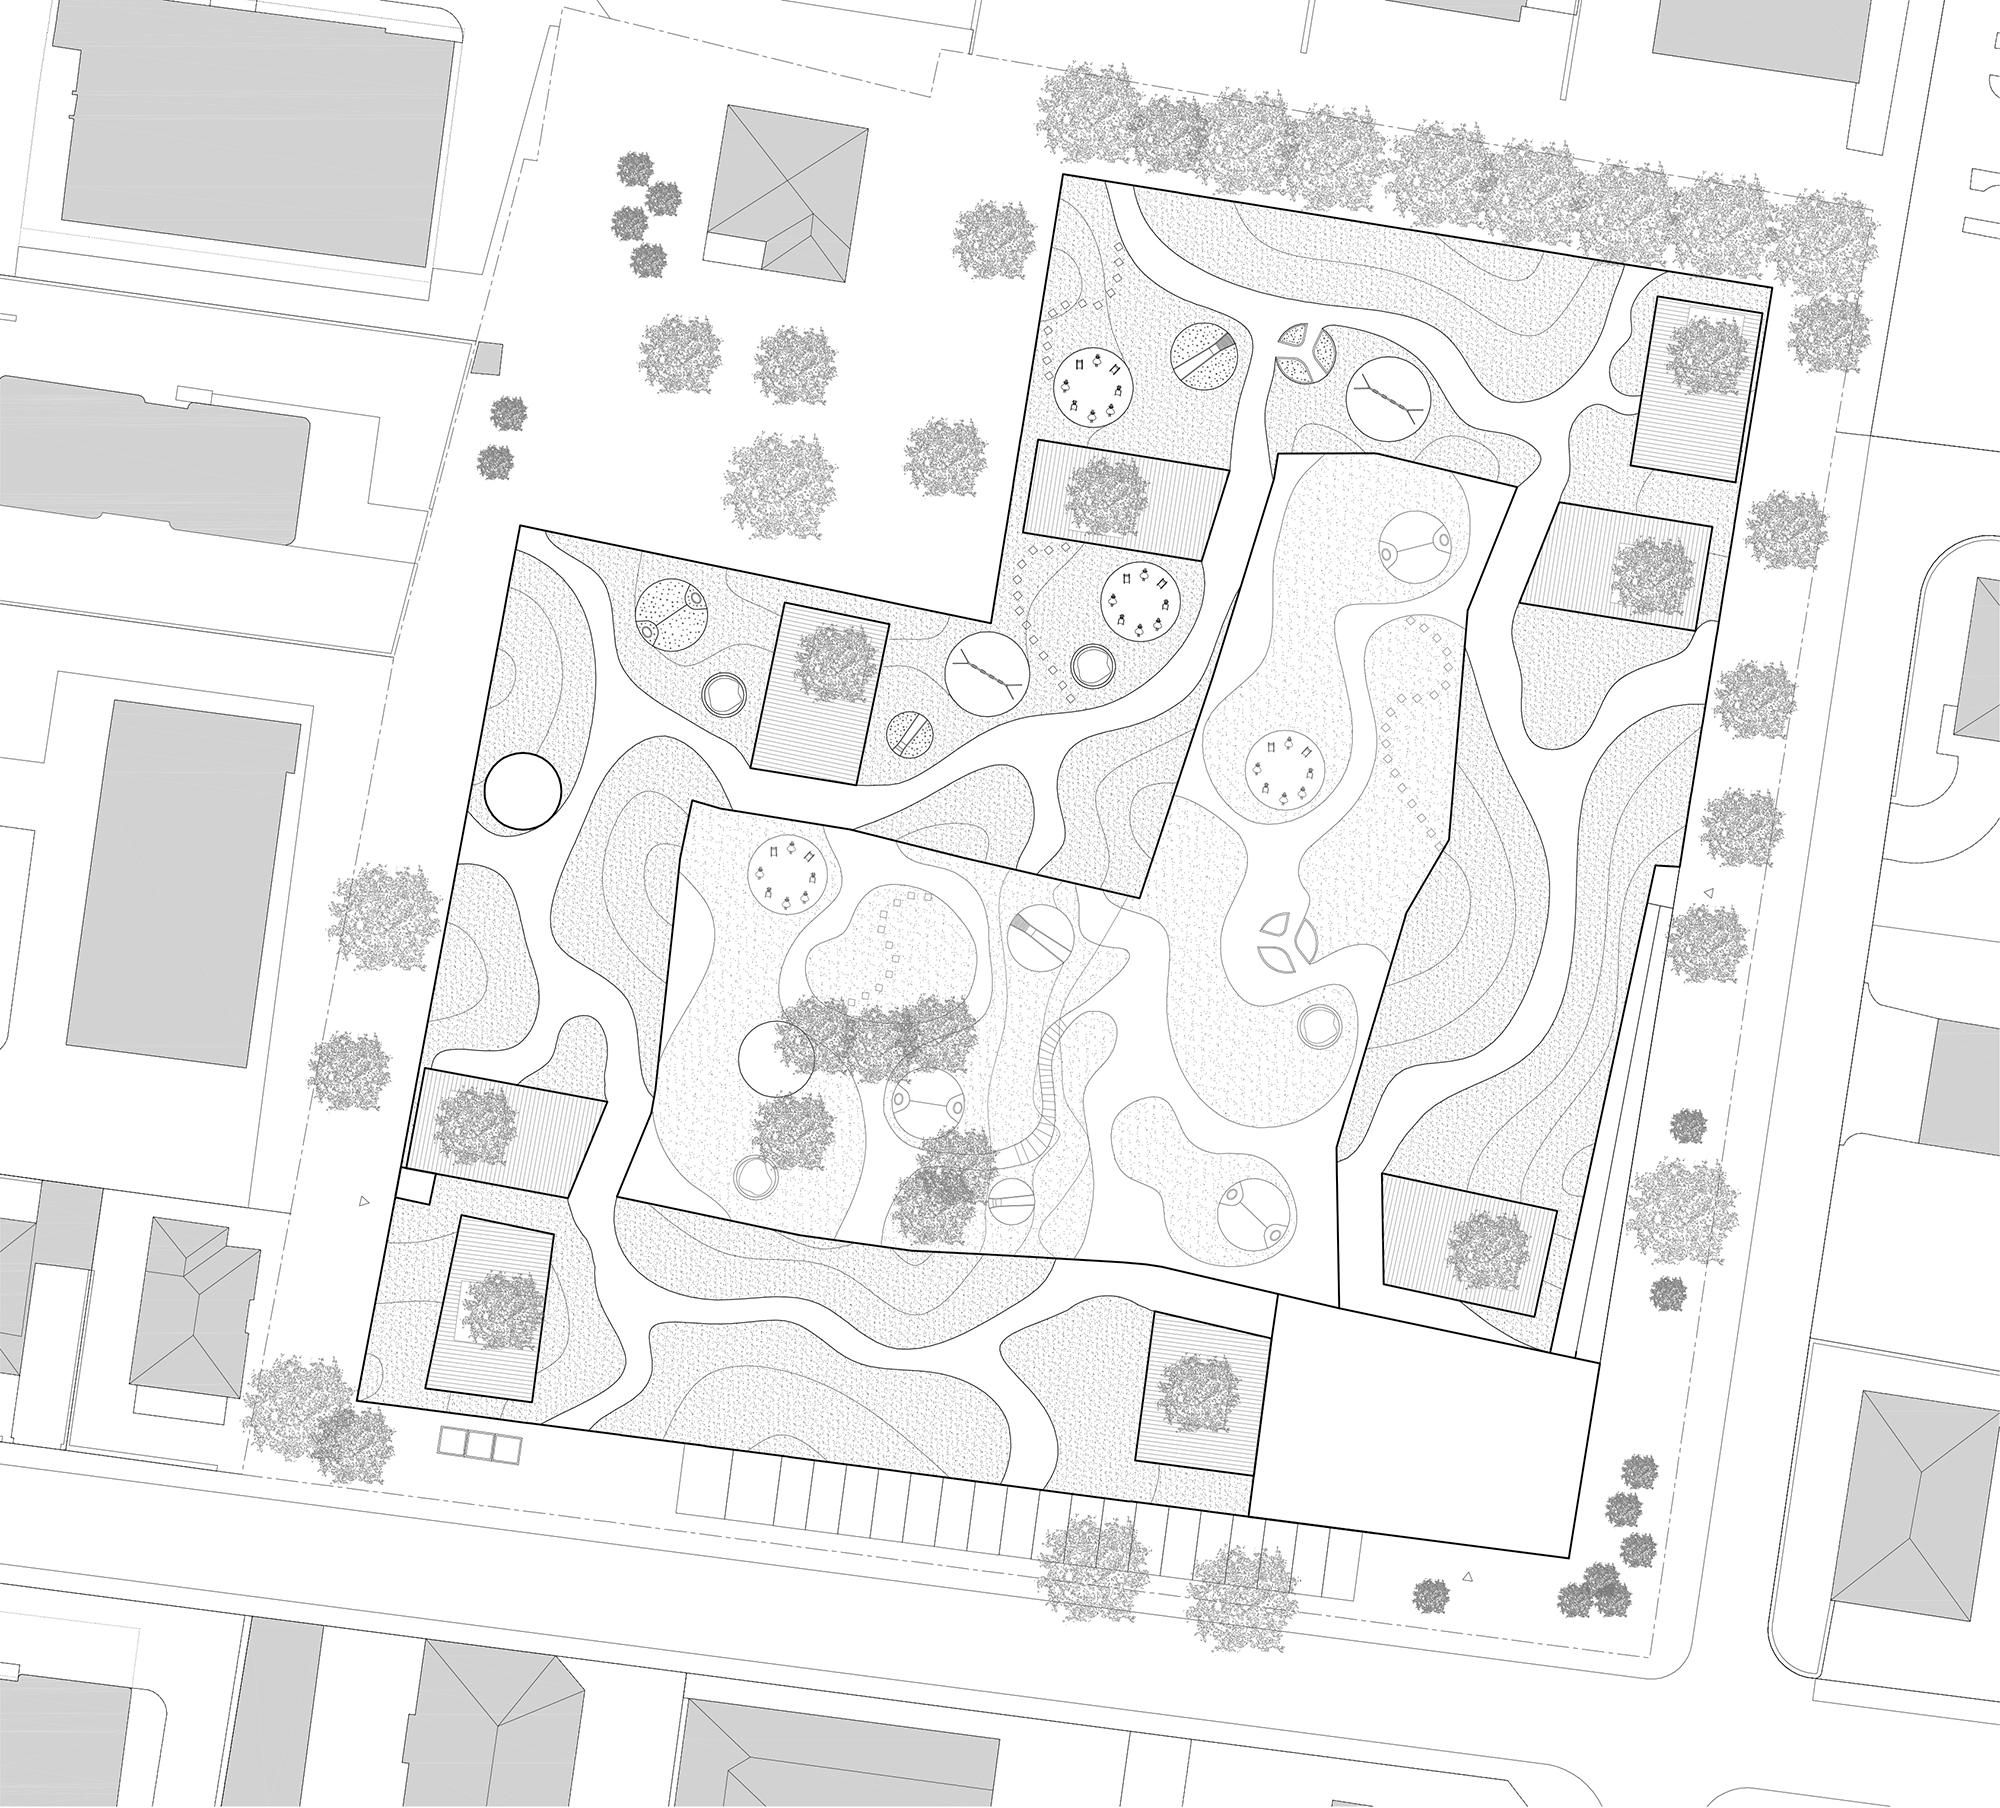 Architektur_offizin-a_gatto.weber.architekten_Projekte_Kultur_HiBaloo_02.jpg